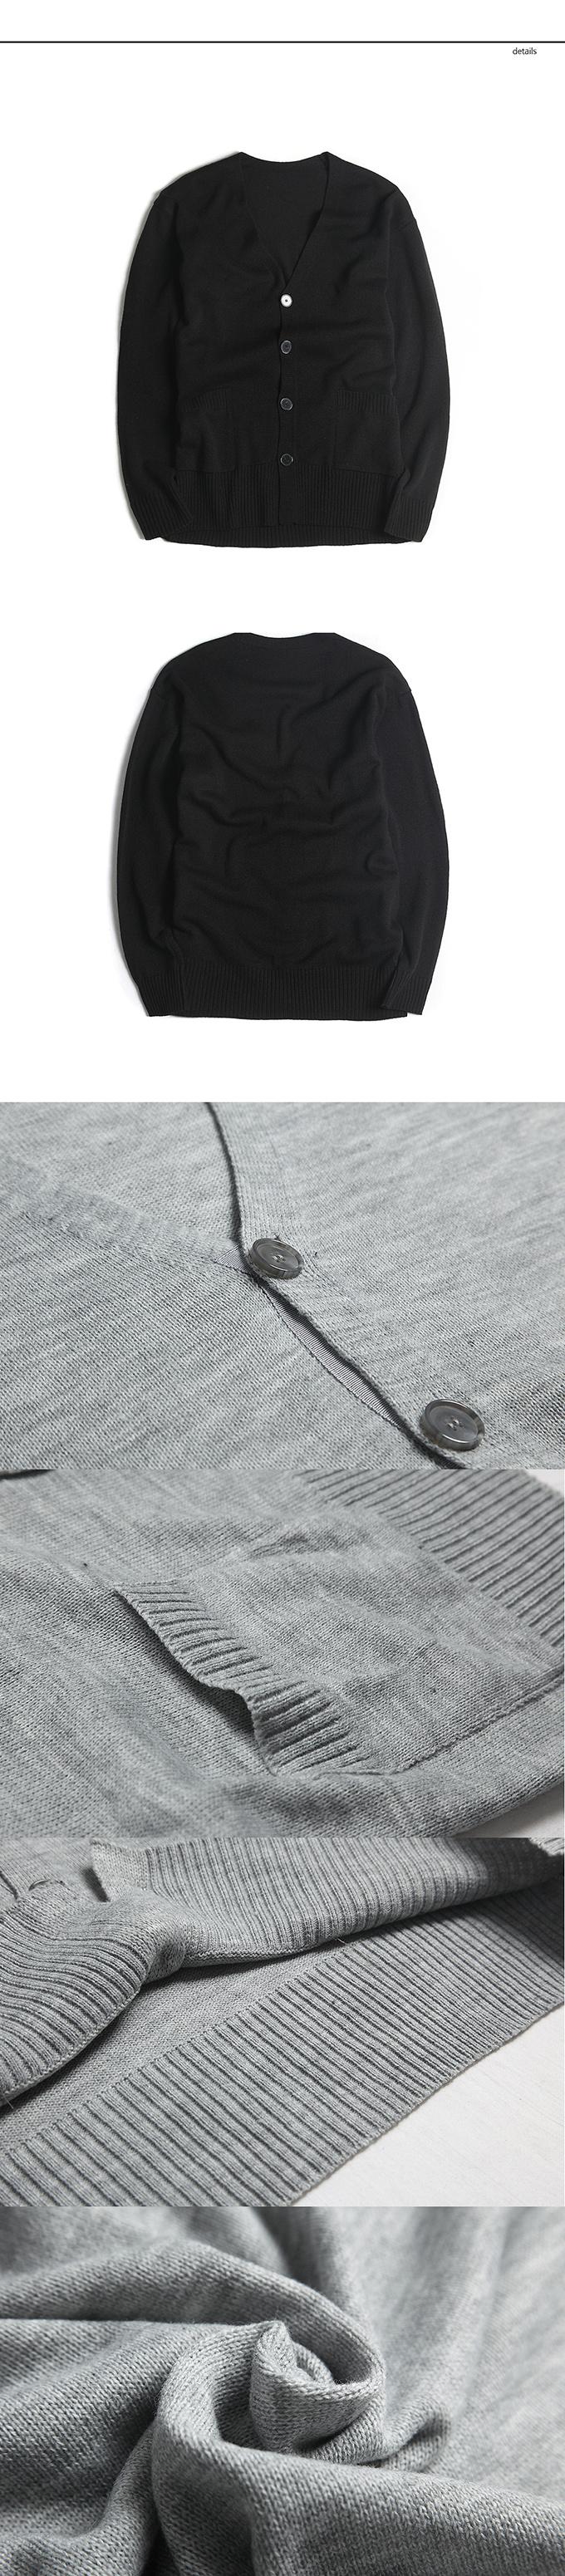 Overlong cardigan(Black) detail.jpg